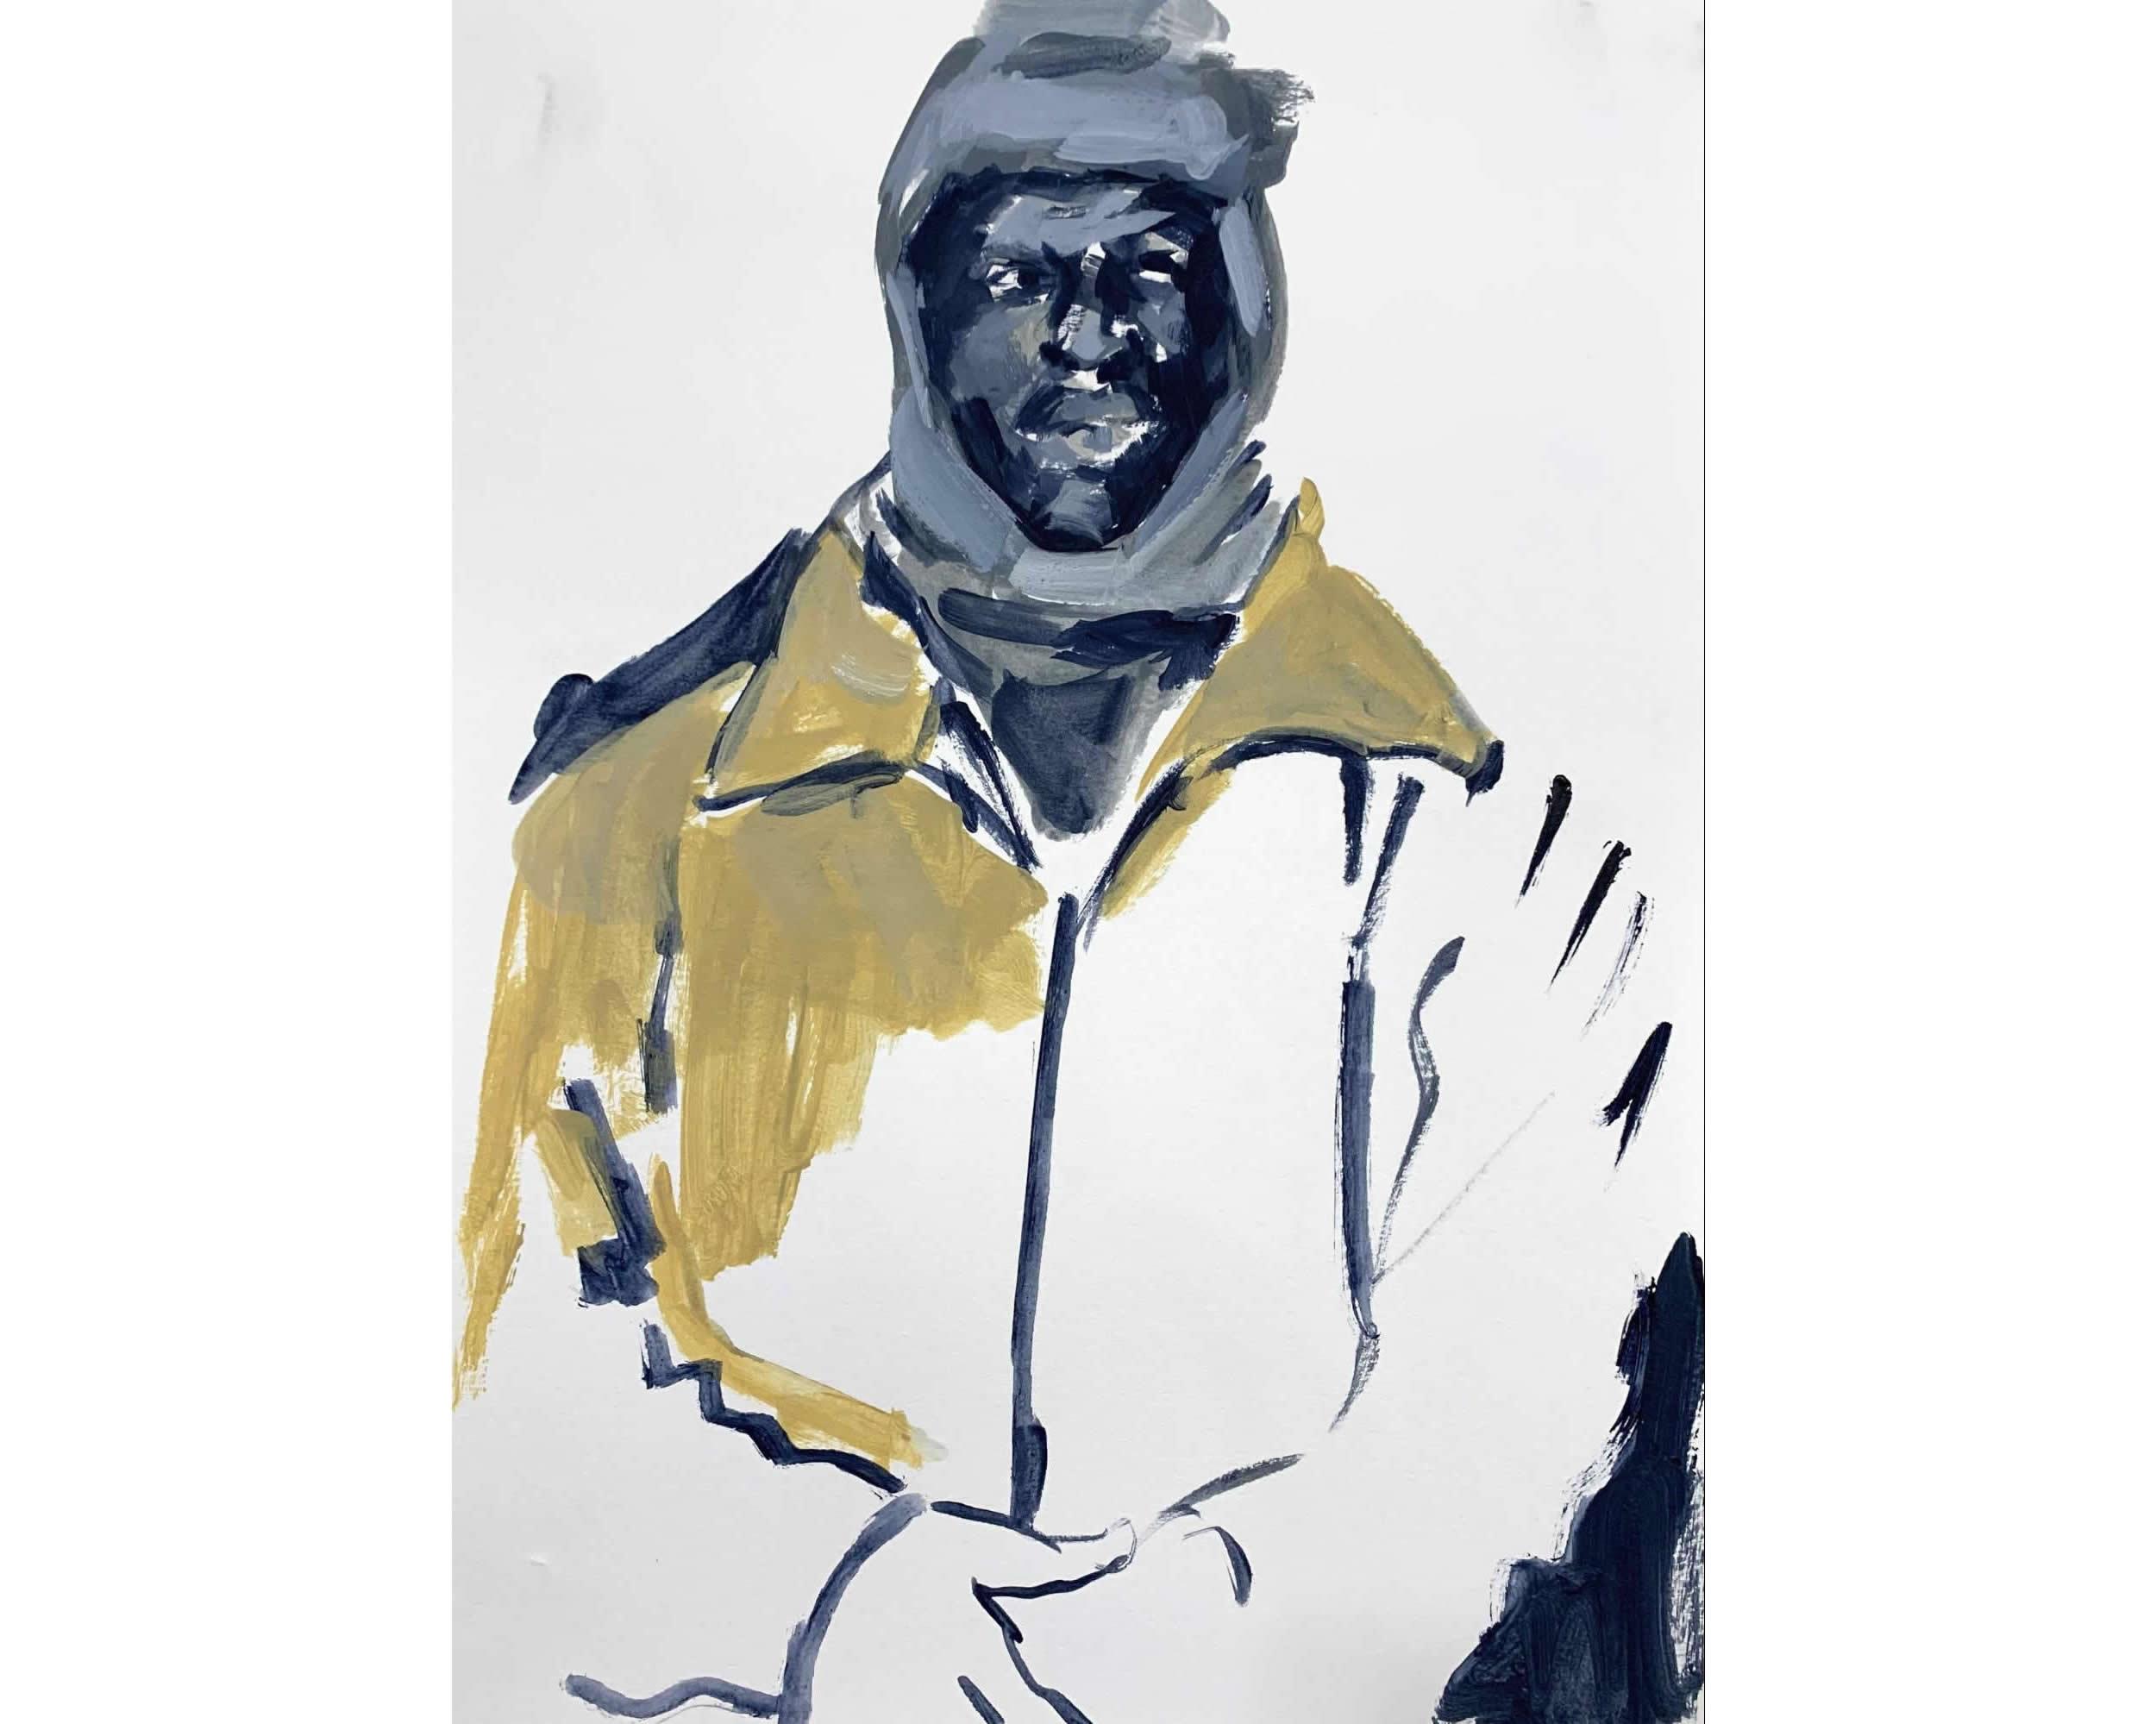 Wangari Mathenge – The Expats Series: Impressions on Paper